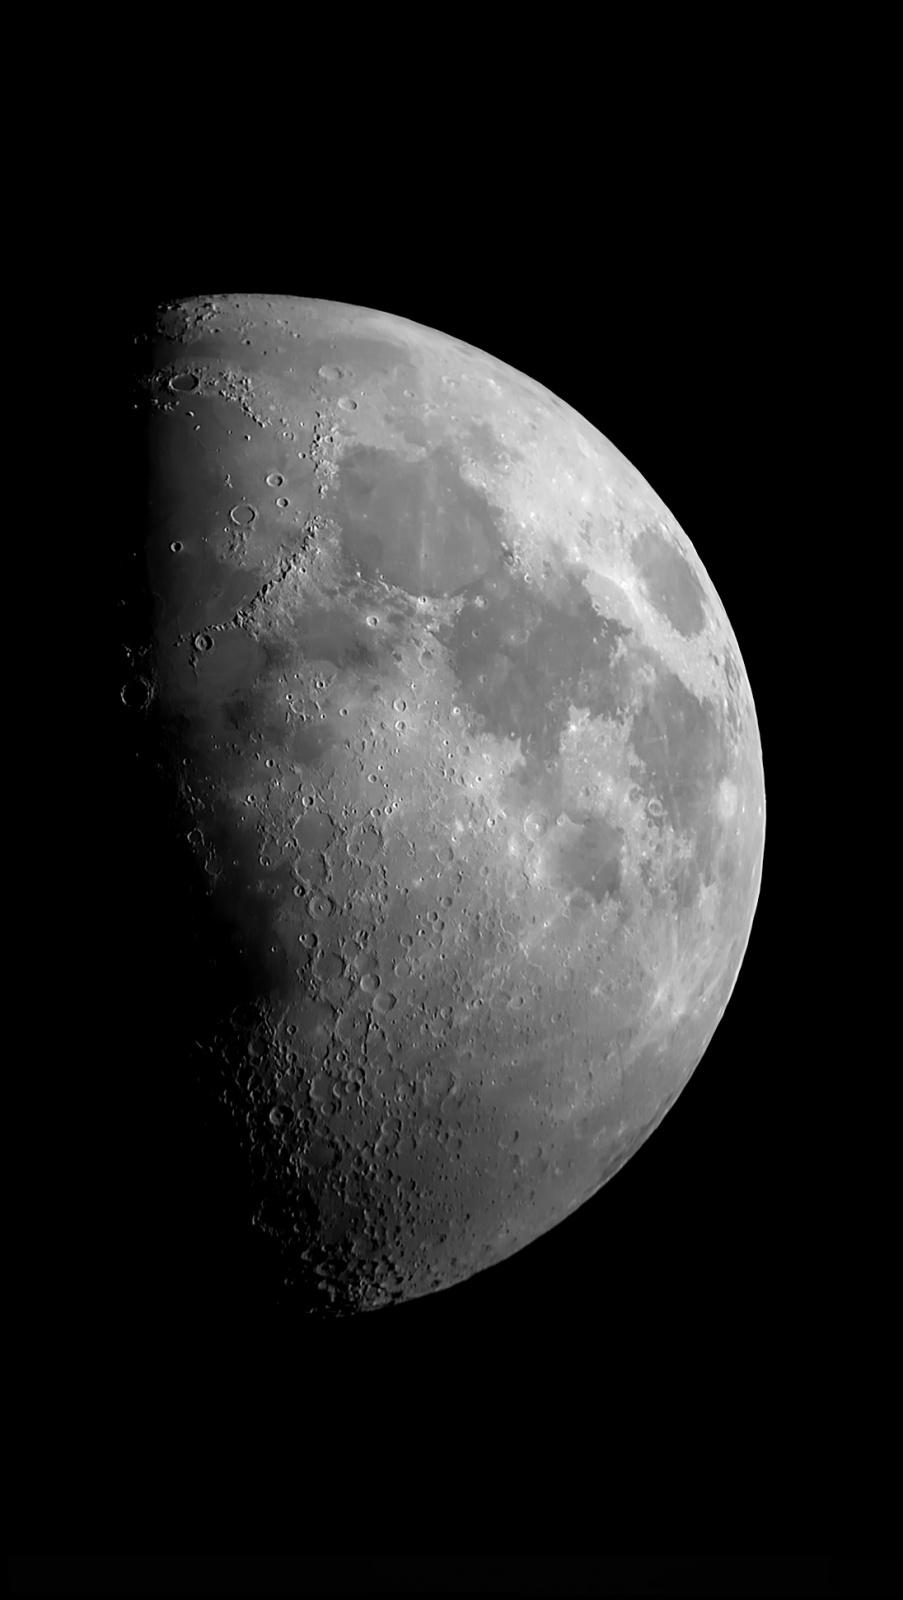 Moon_200521.thumb.jpg.f2575c9e1c5641518c3b01a660bc21b8.jpg